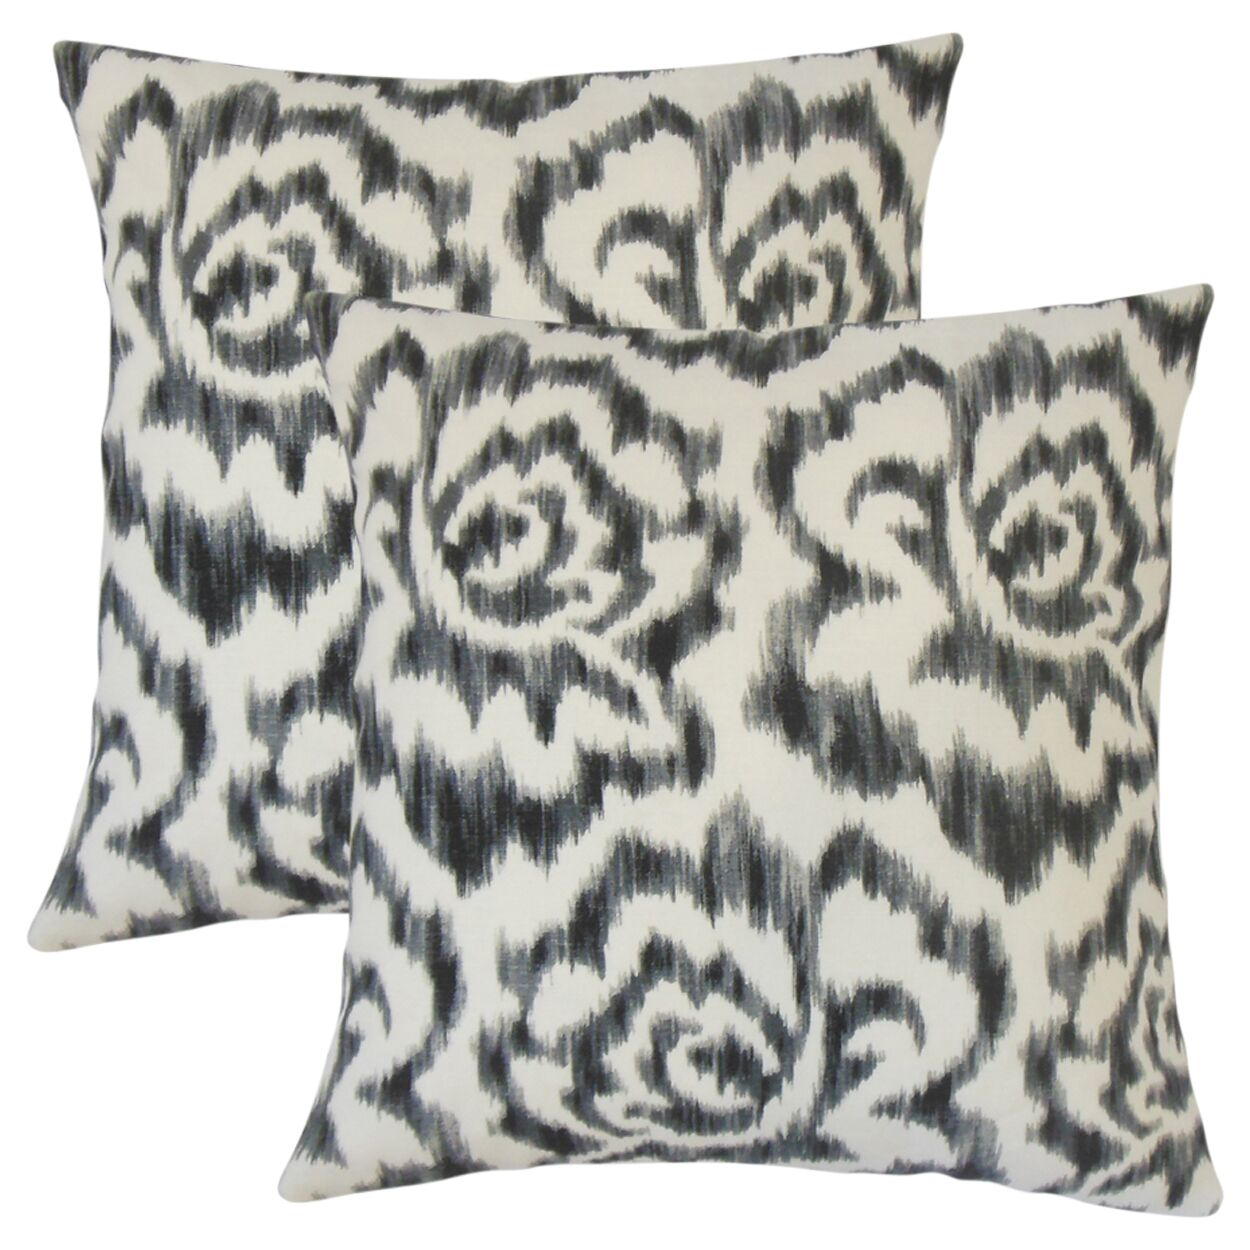 Wilmington Ikat Cotton Throw Pillow